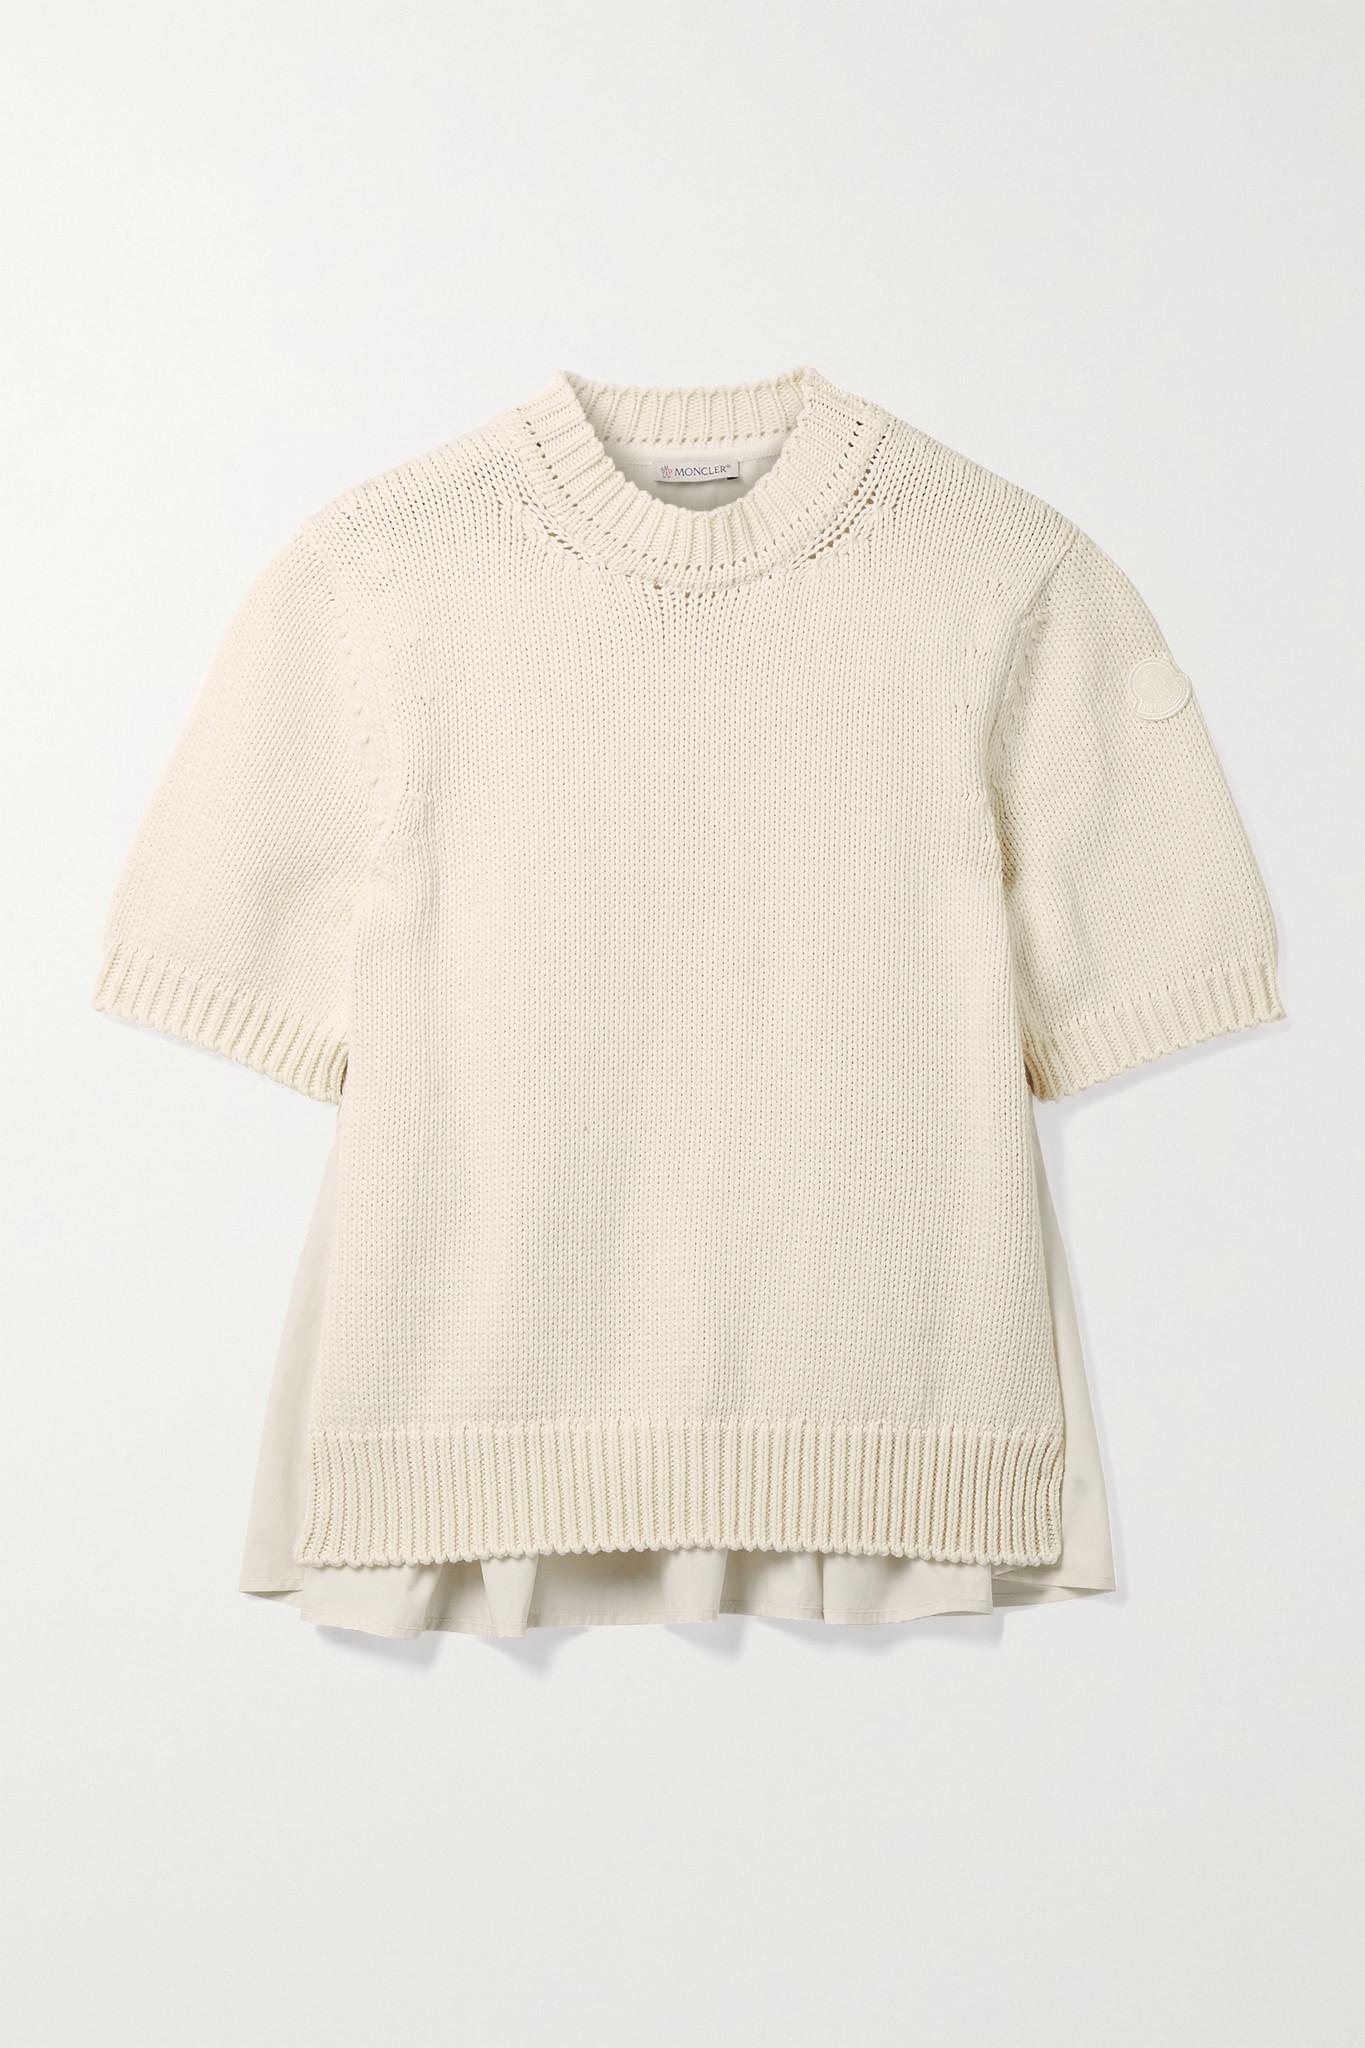 MONCLER - Paneled Cotton And Poplin Sweater - Off-white - medium